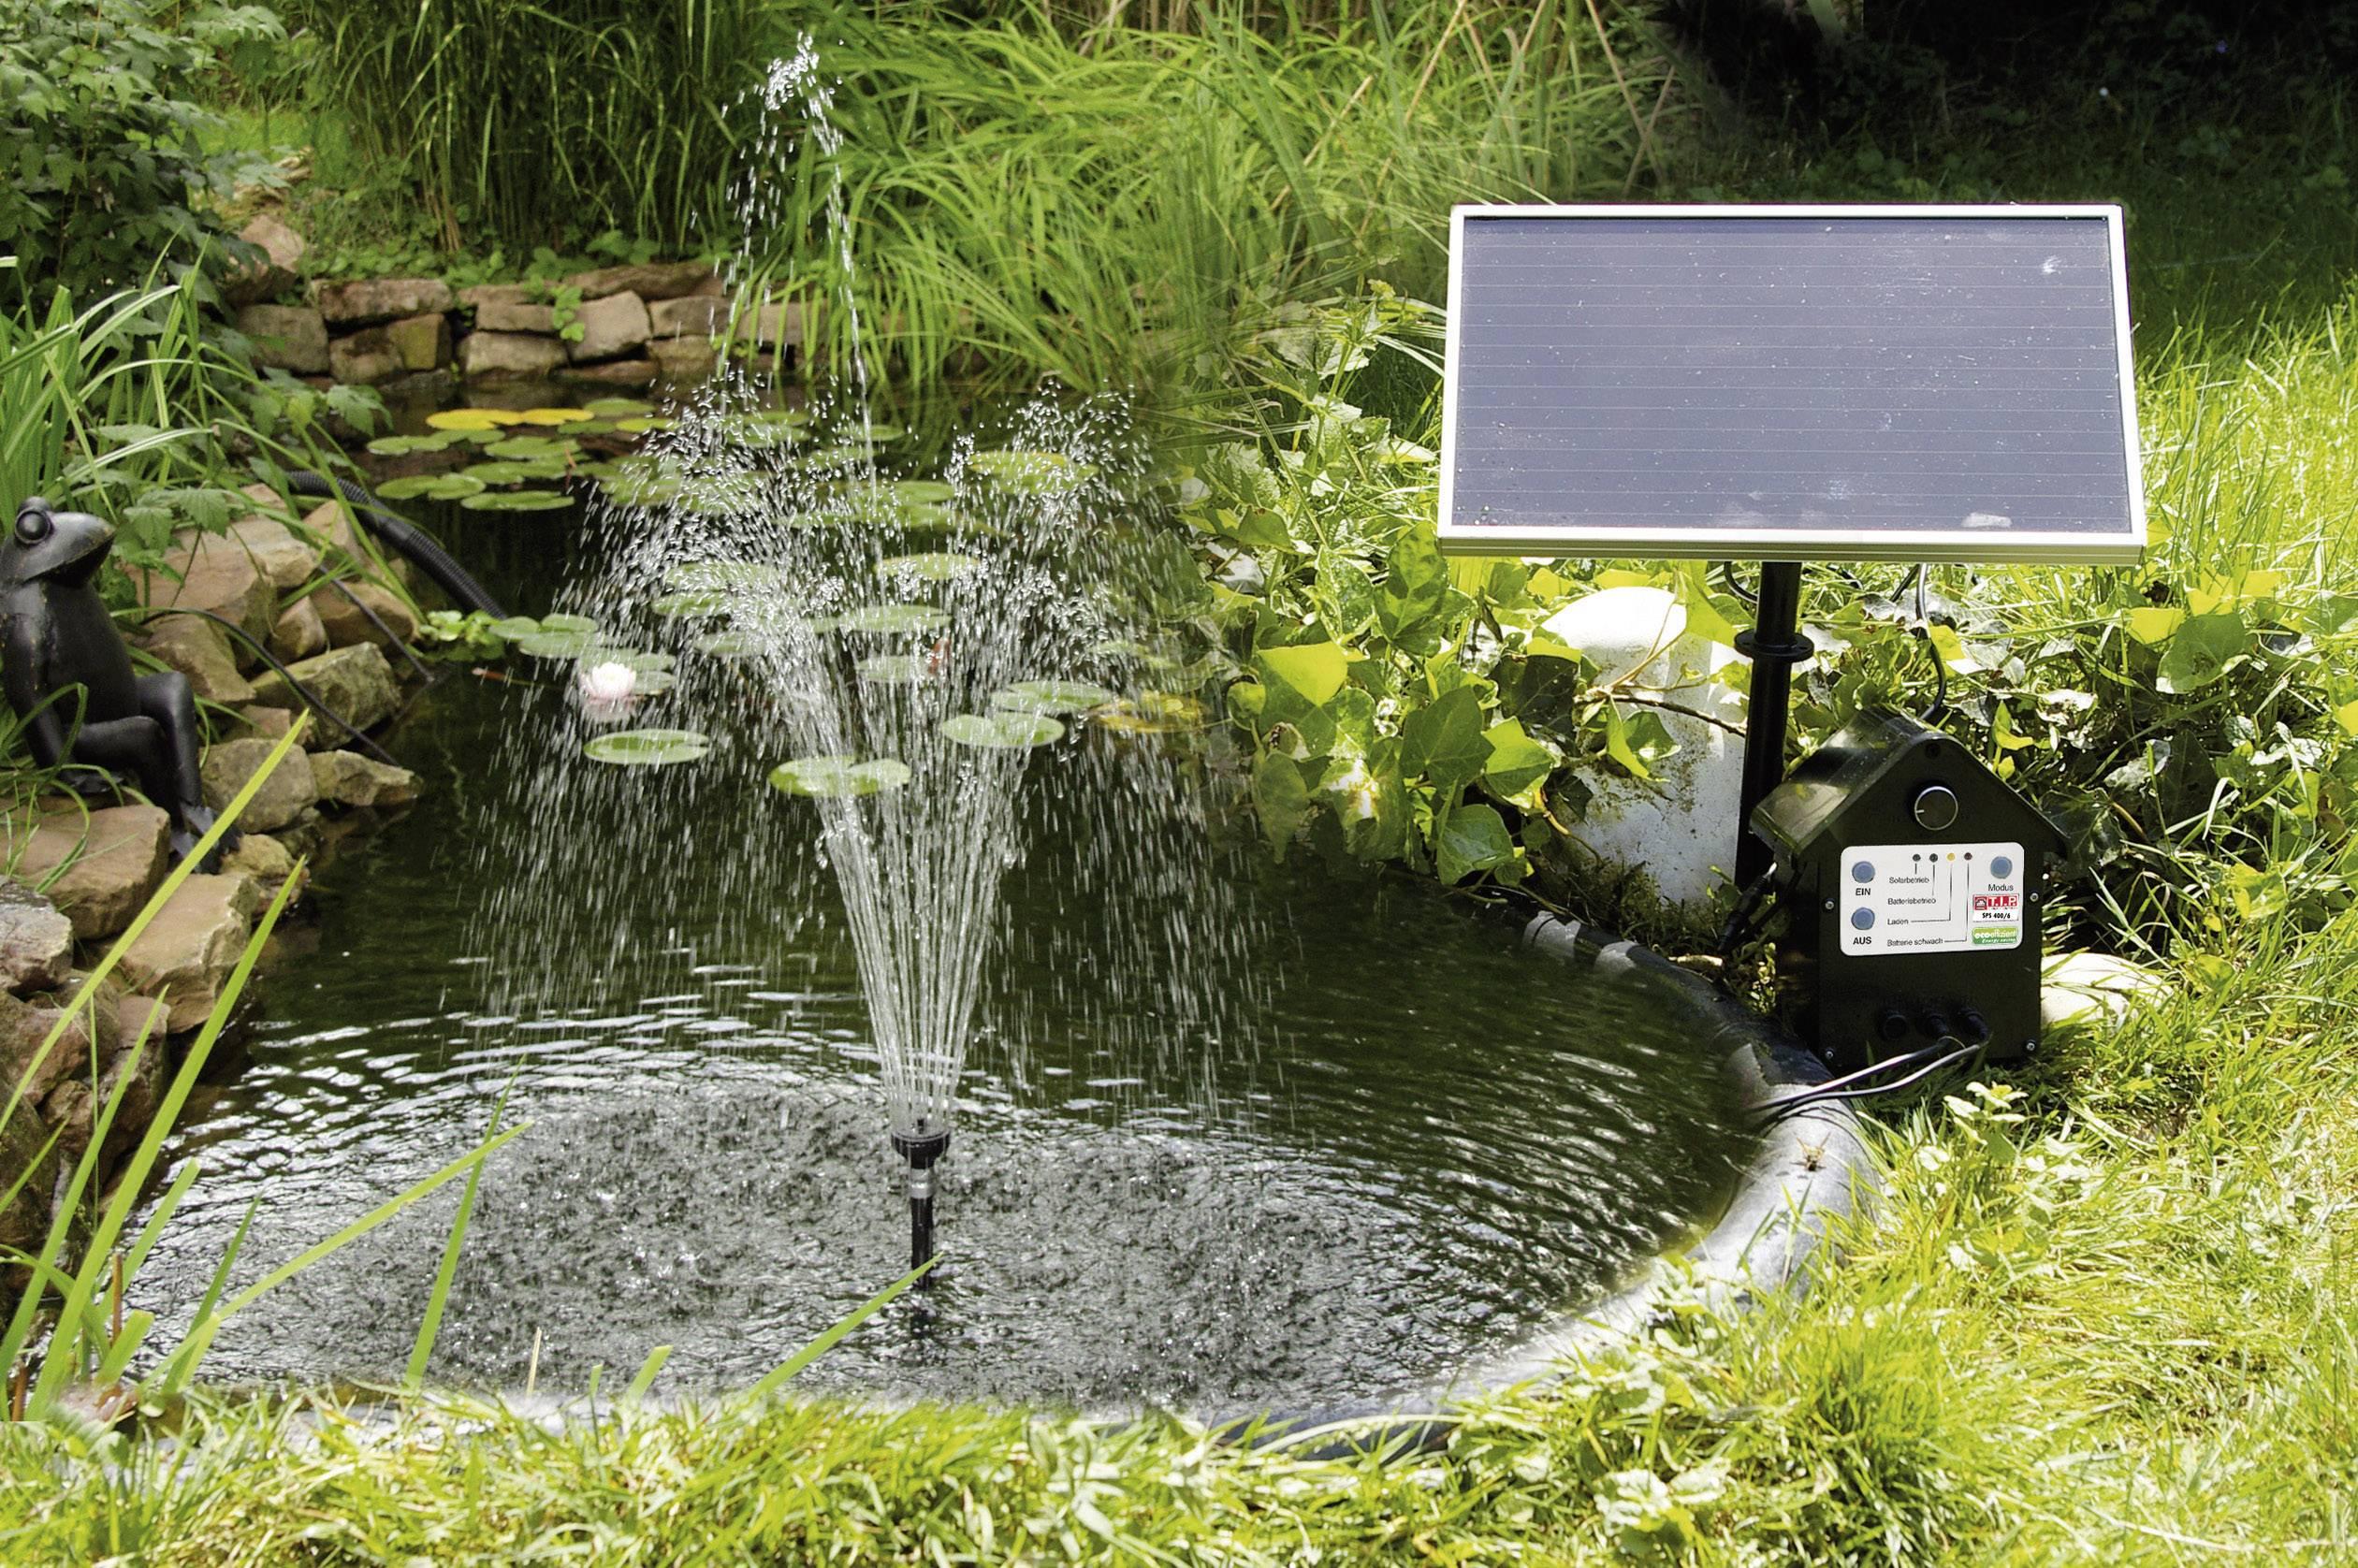 Solarbetriebene Springbrunnenpumpe